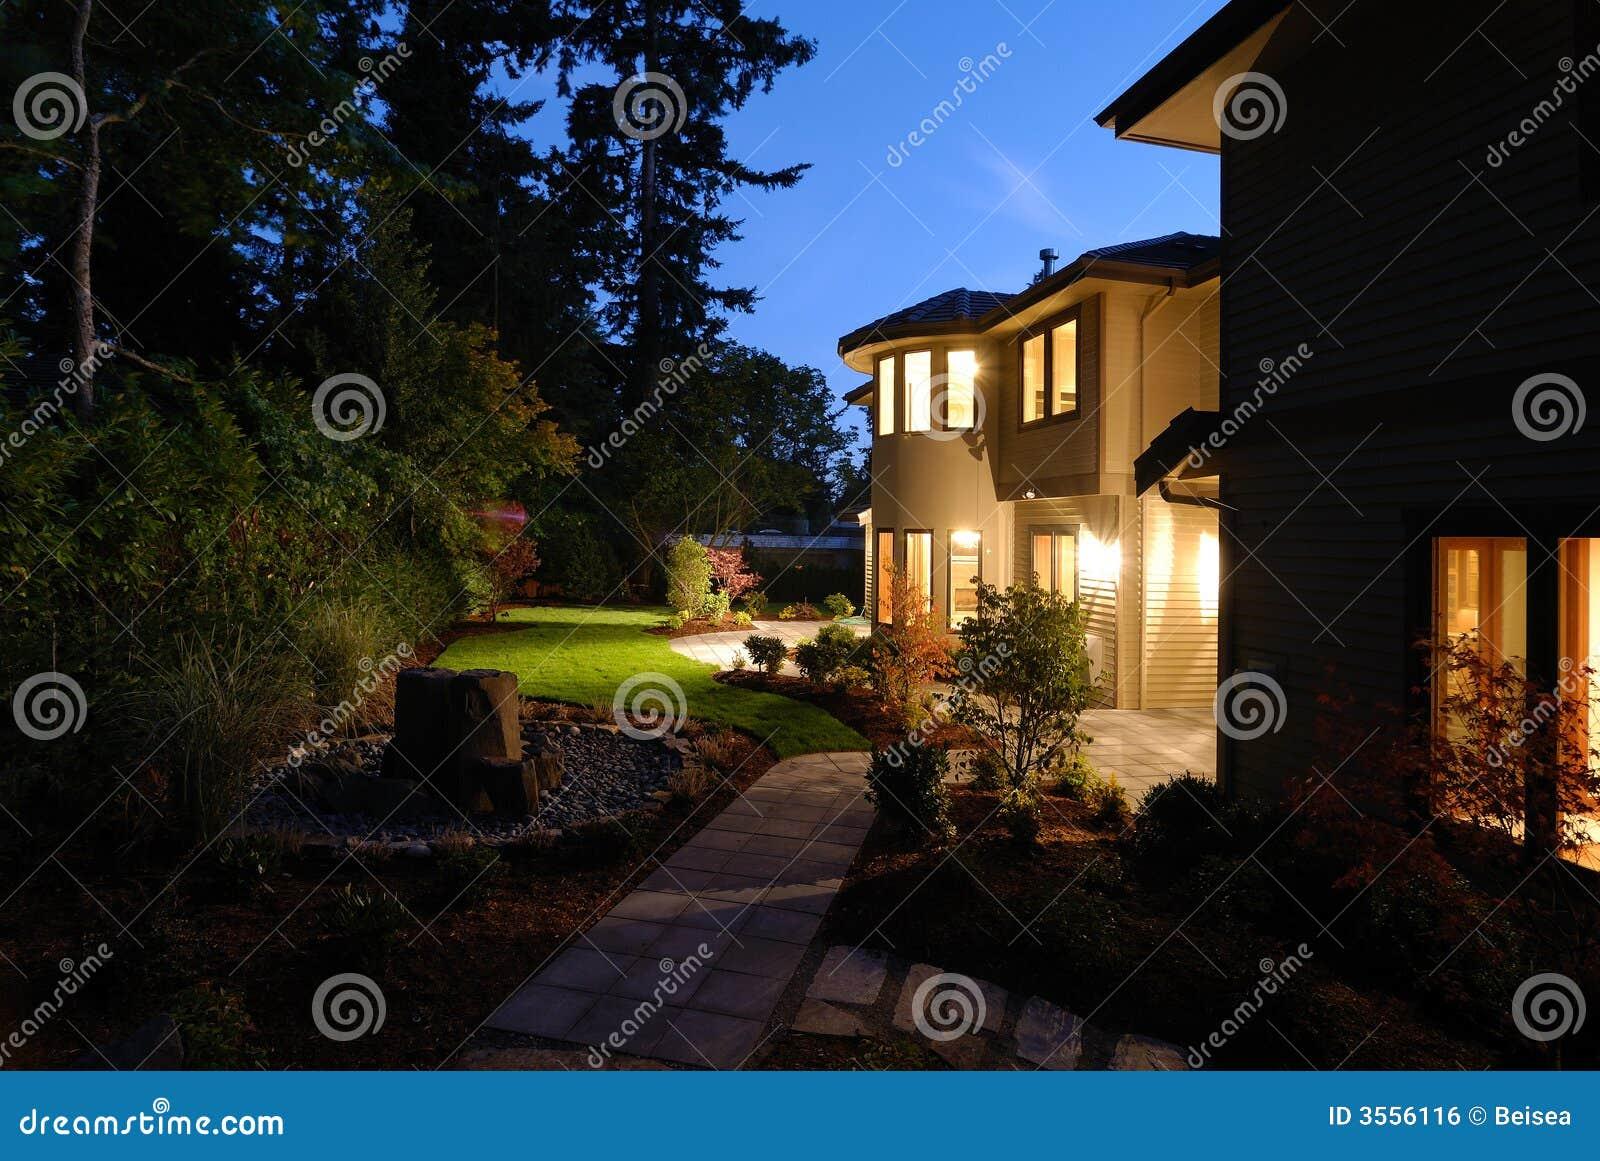 Notte al cortile